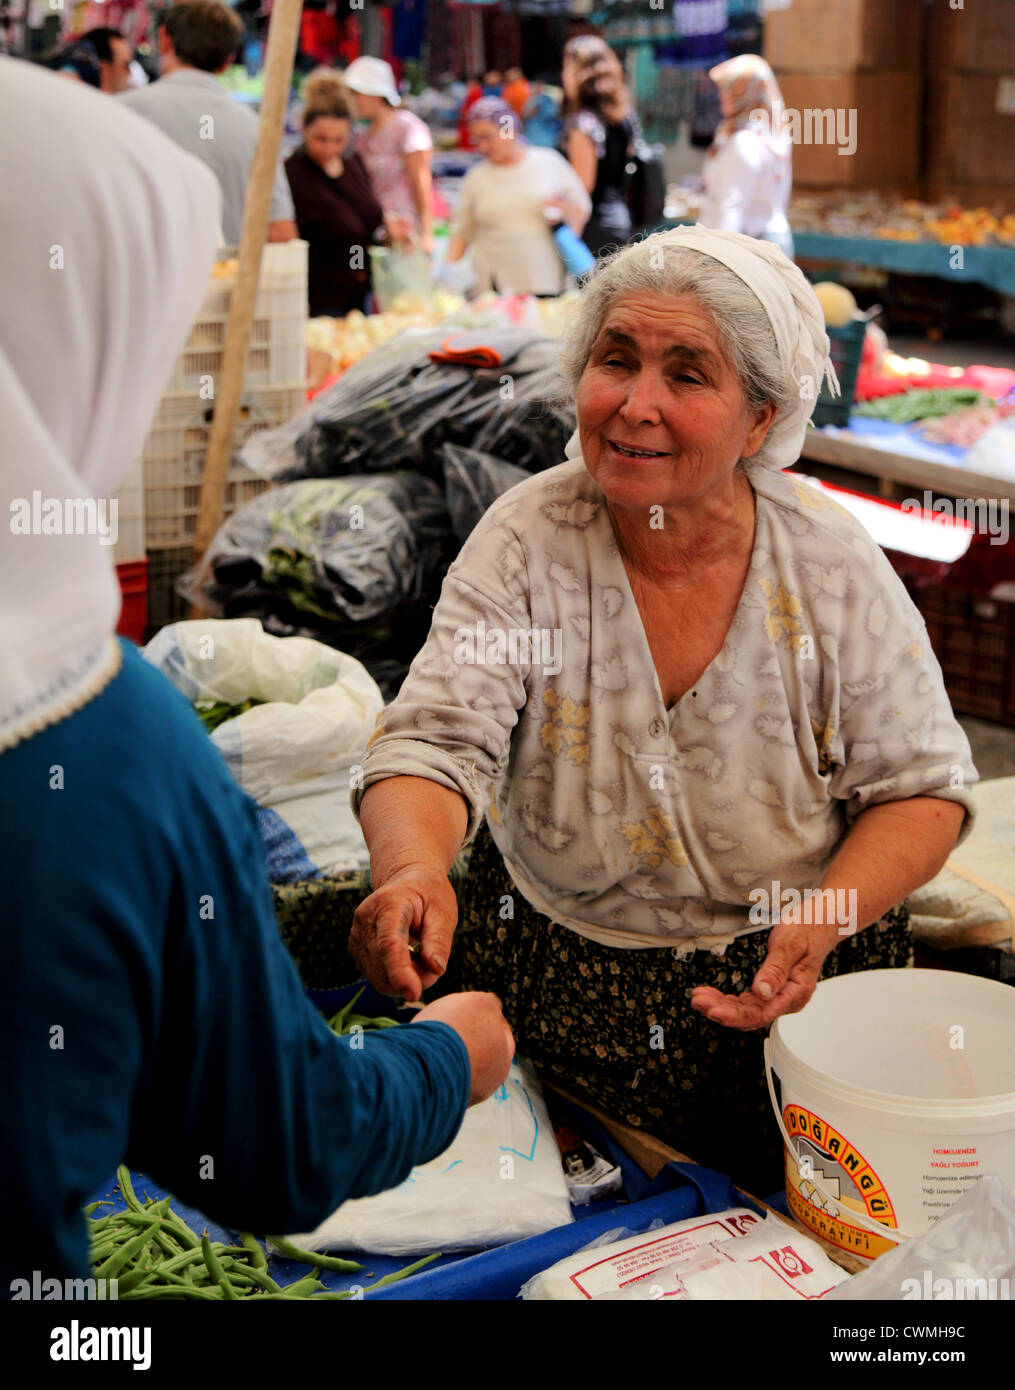 Turkish woman stallkeeper gives change to female customer in market near Dalyan Turkey - Stock Image